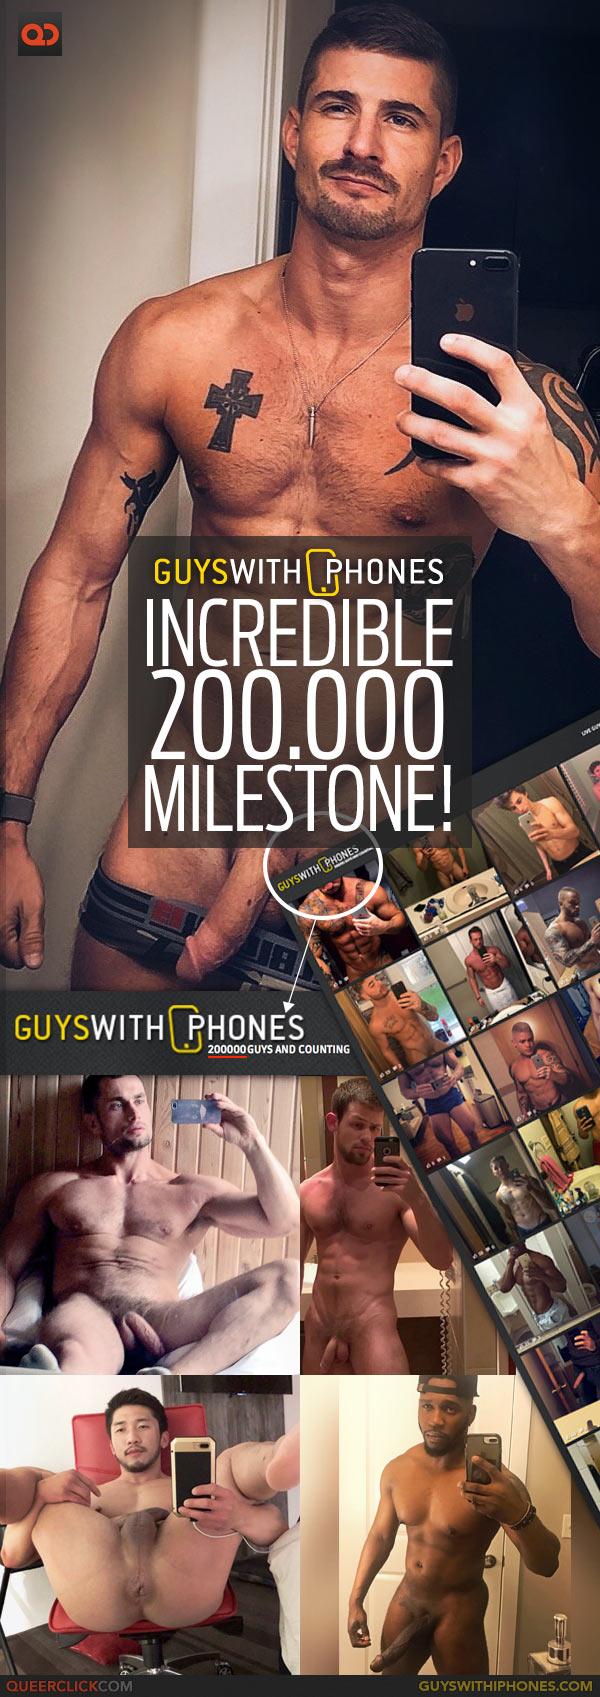 GuysWithiPhones' Incredible 200.000 Milestone!